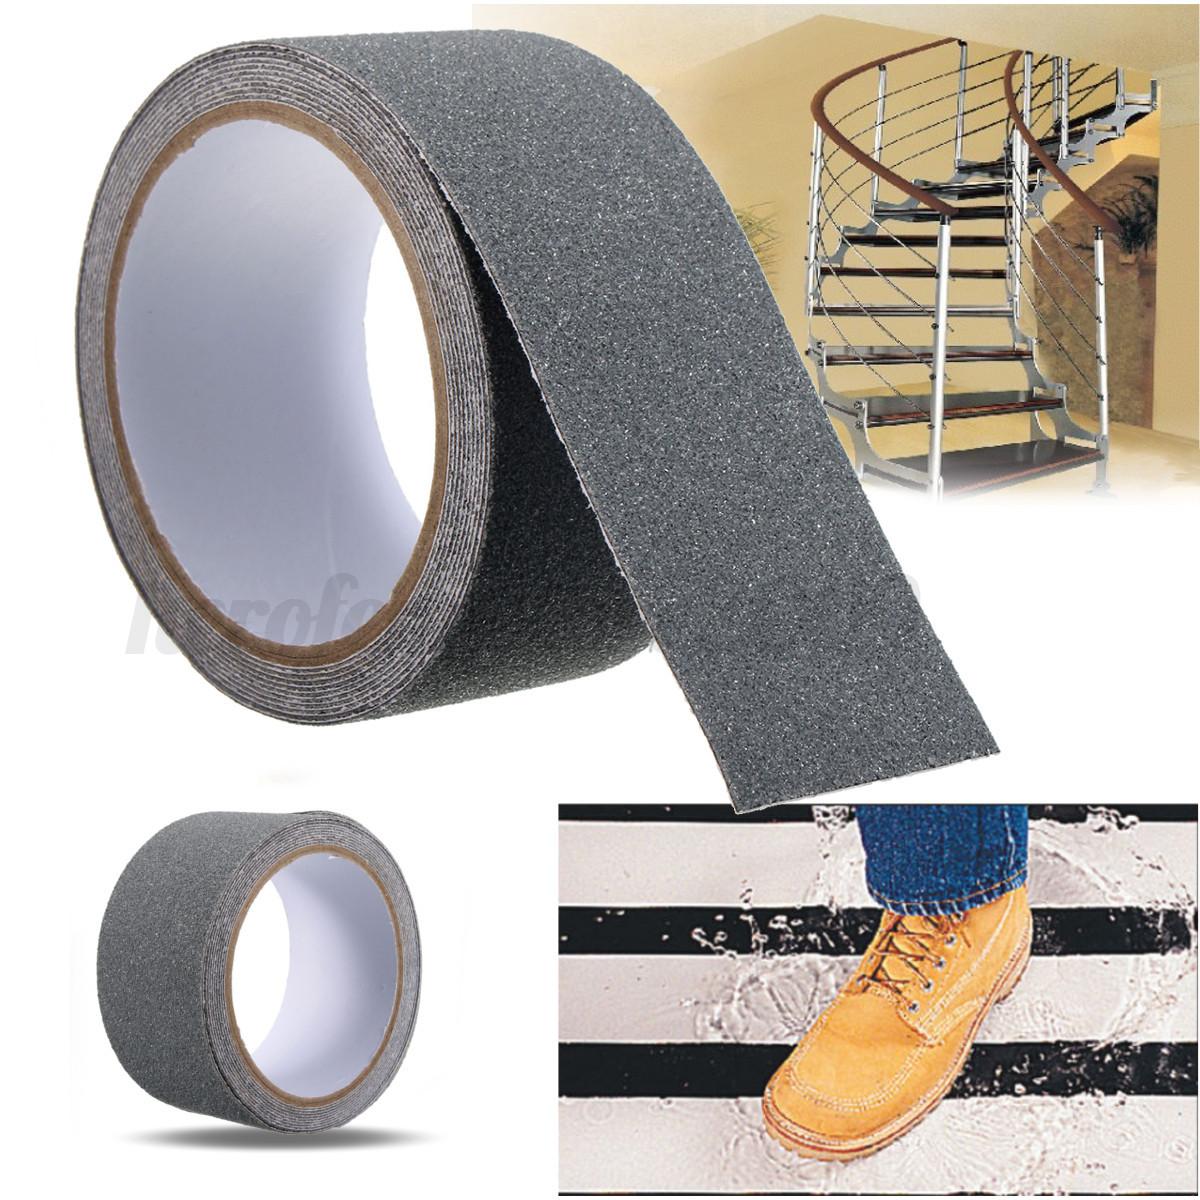 Anti Slip Floor Grips : M cm floor safety non skid tape roll anti slip adhesive